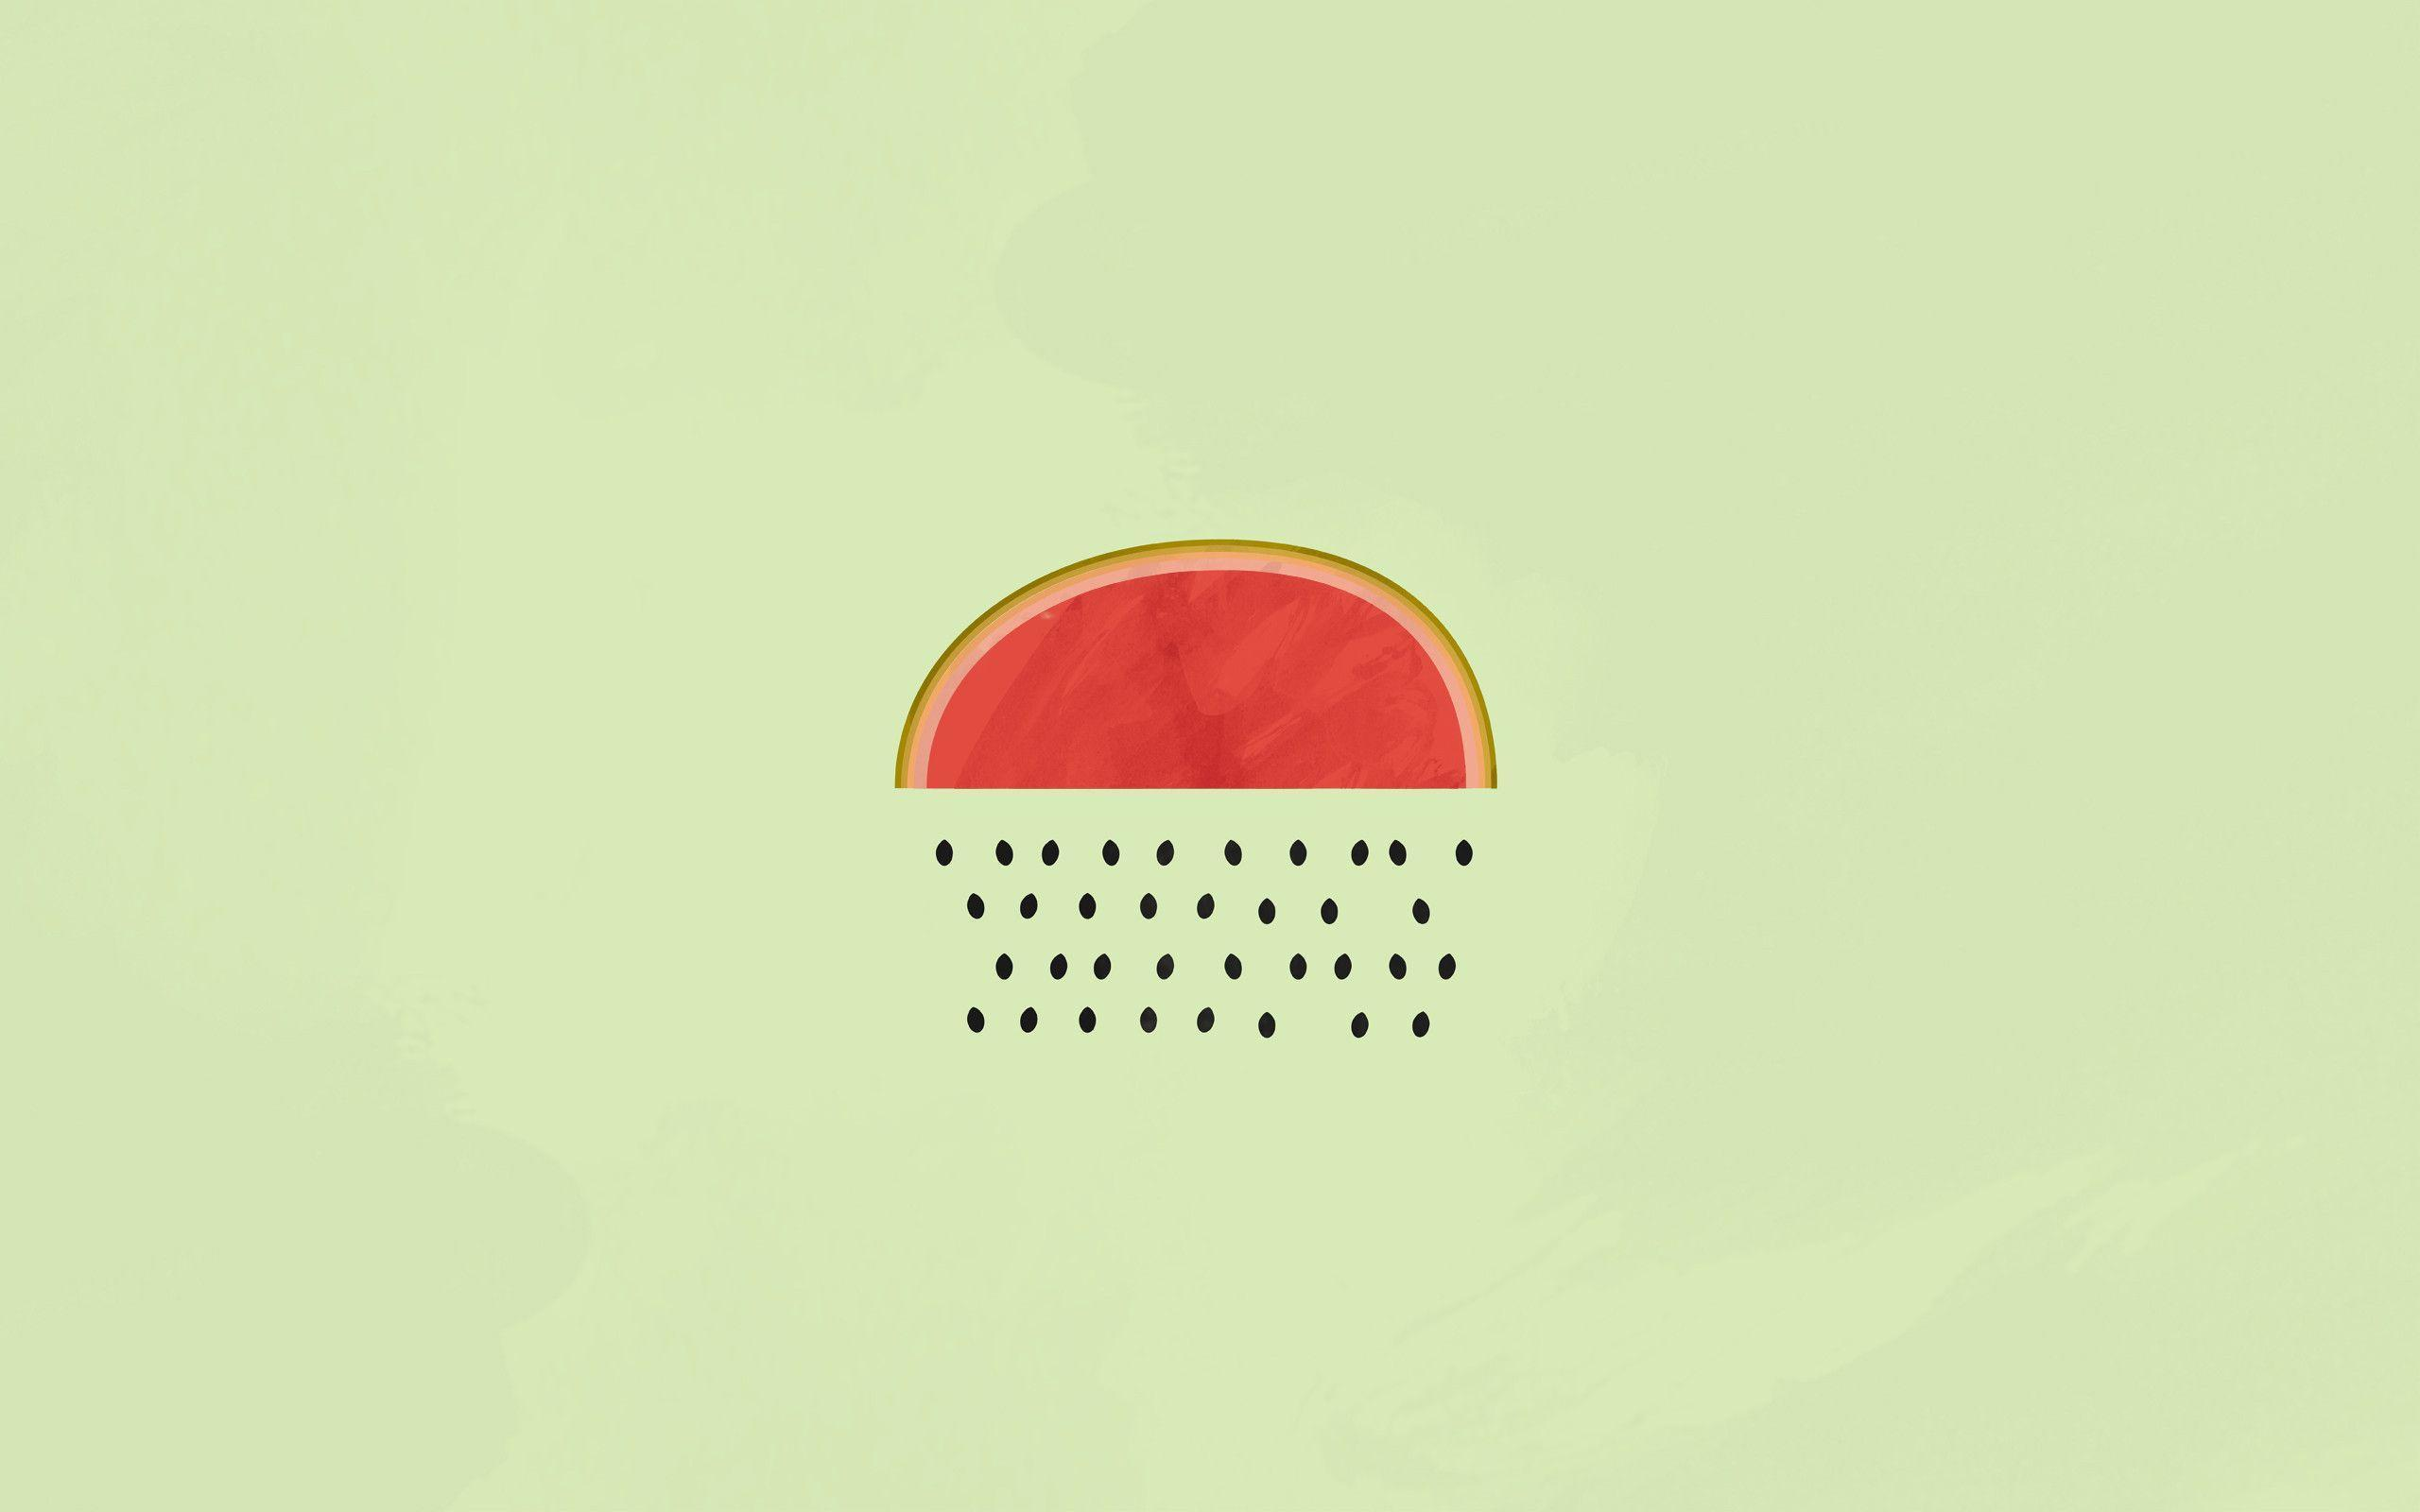 Gravity Falls Minimalist Wallpaper Watermelon Wallpapers Wallpaper Cave